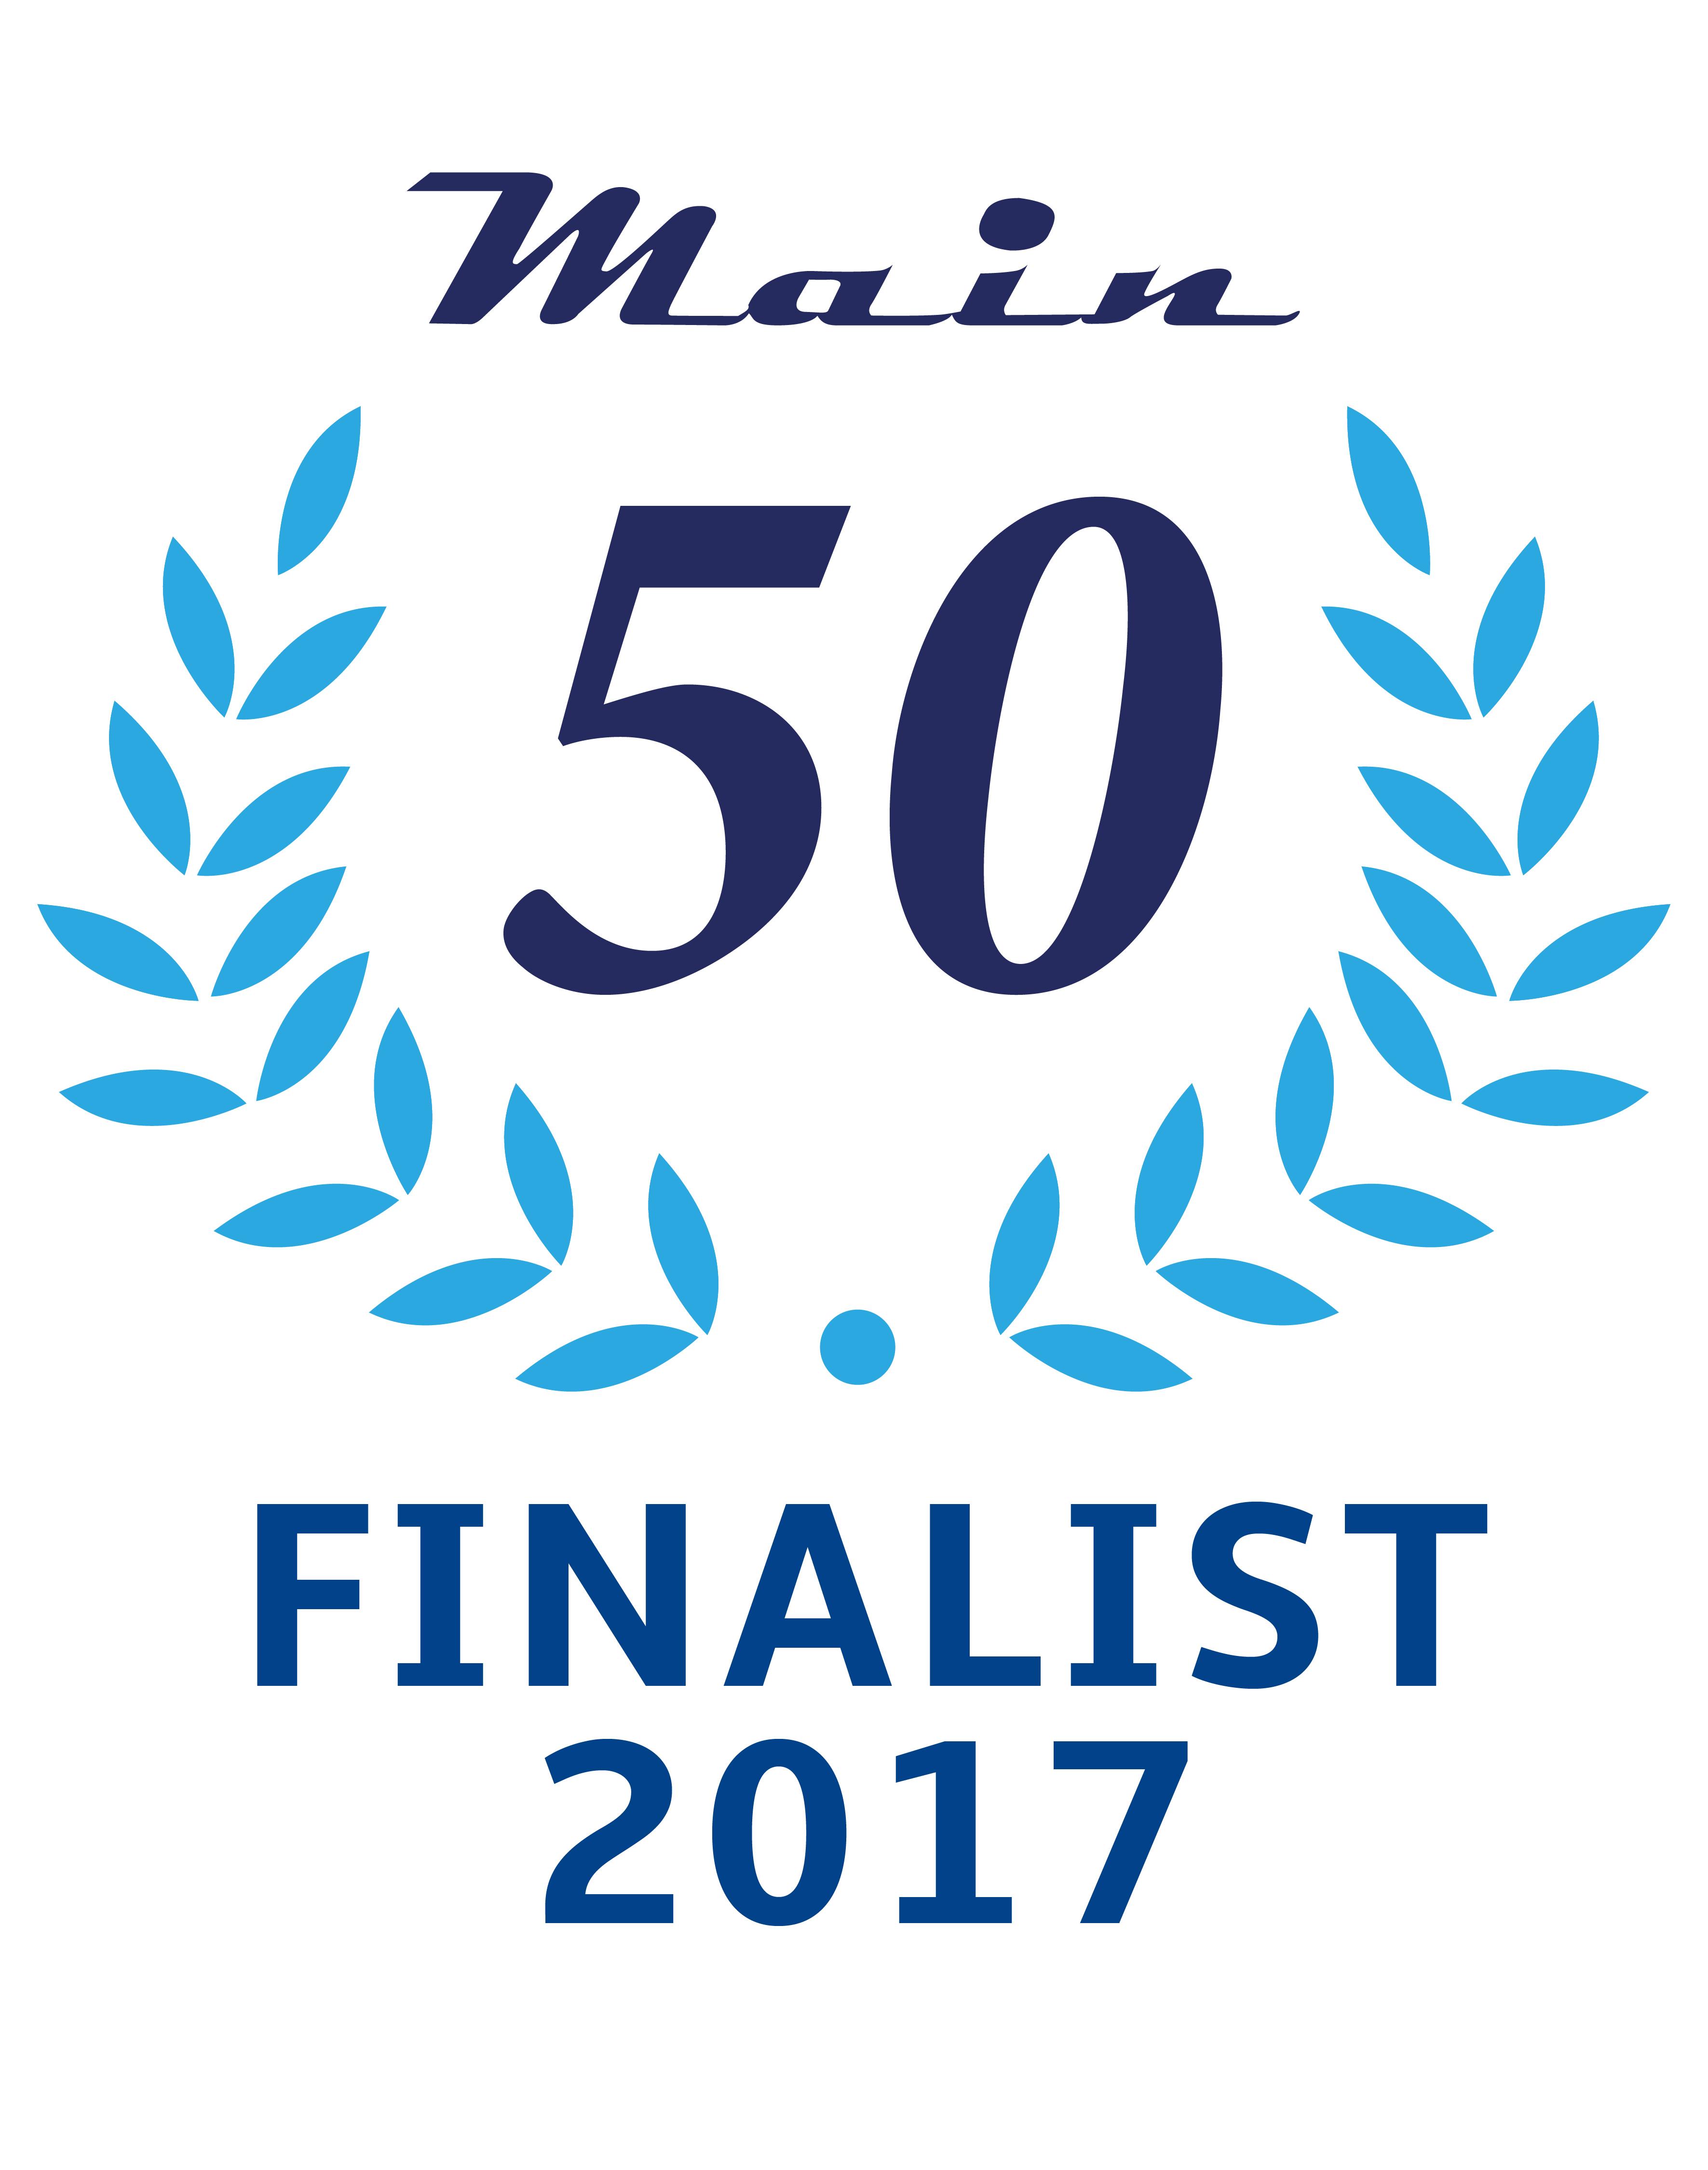 FIQAS main50 Finalist 2017